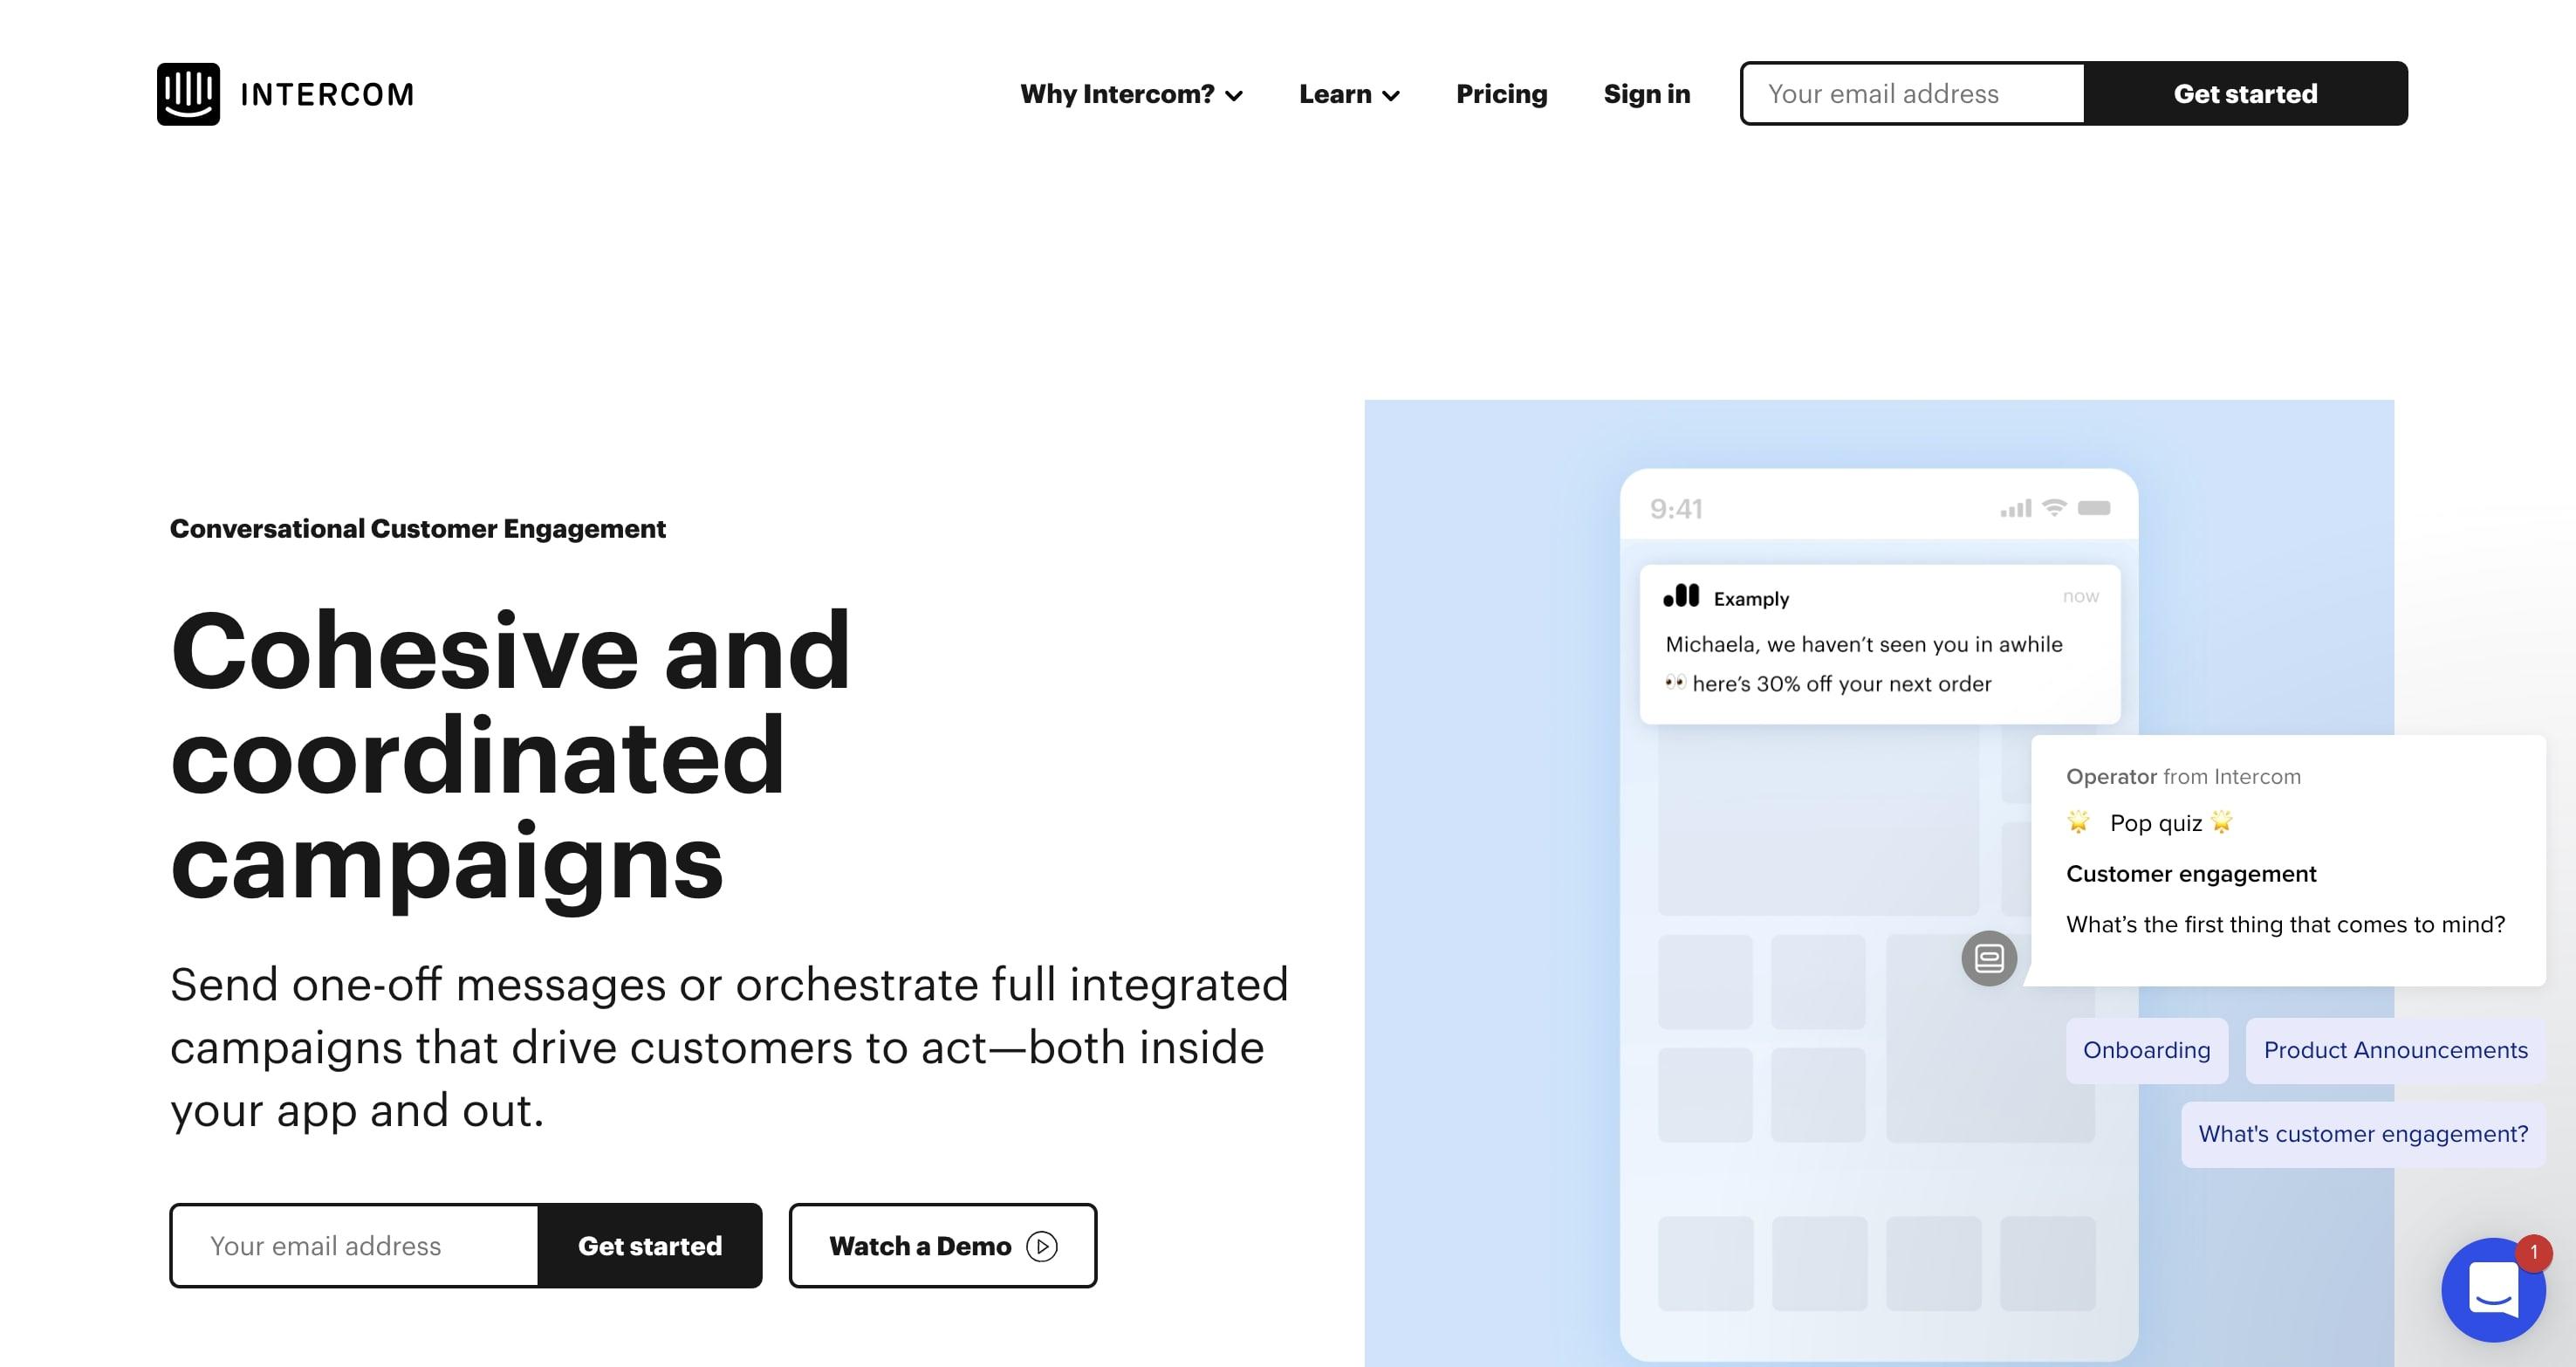 Intercom Customer Engagement page